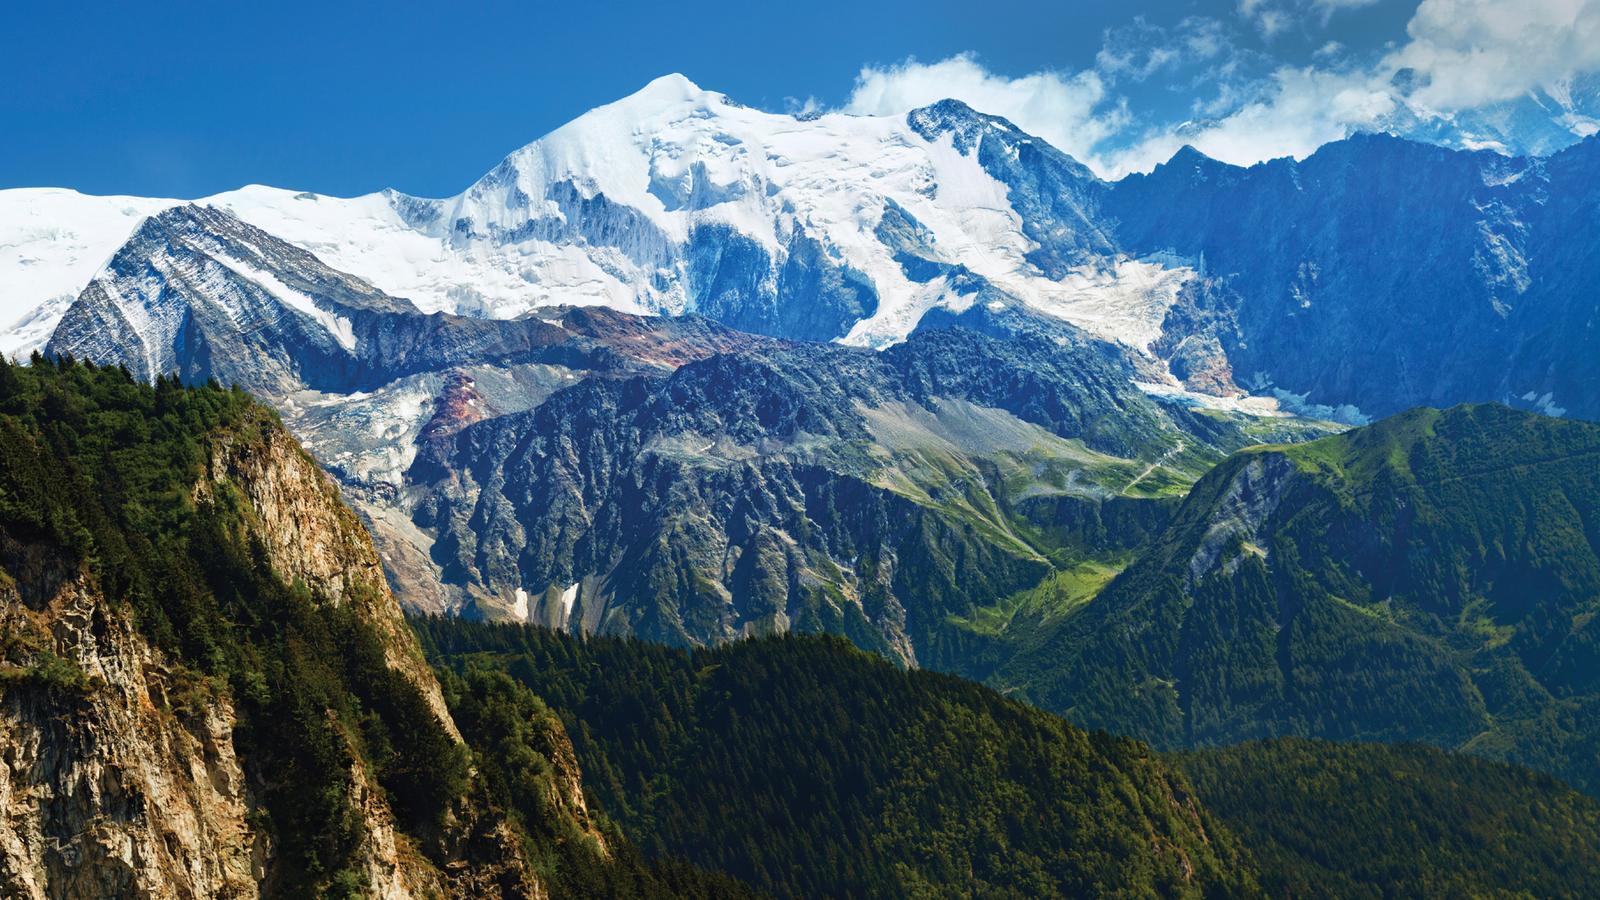 Paragliding Wallpaper Hd Mont Blanc Explorer In France Europe G Adventures